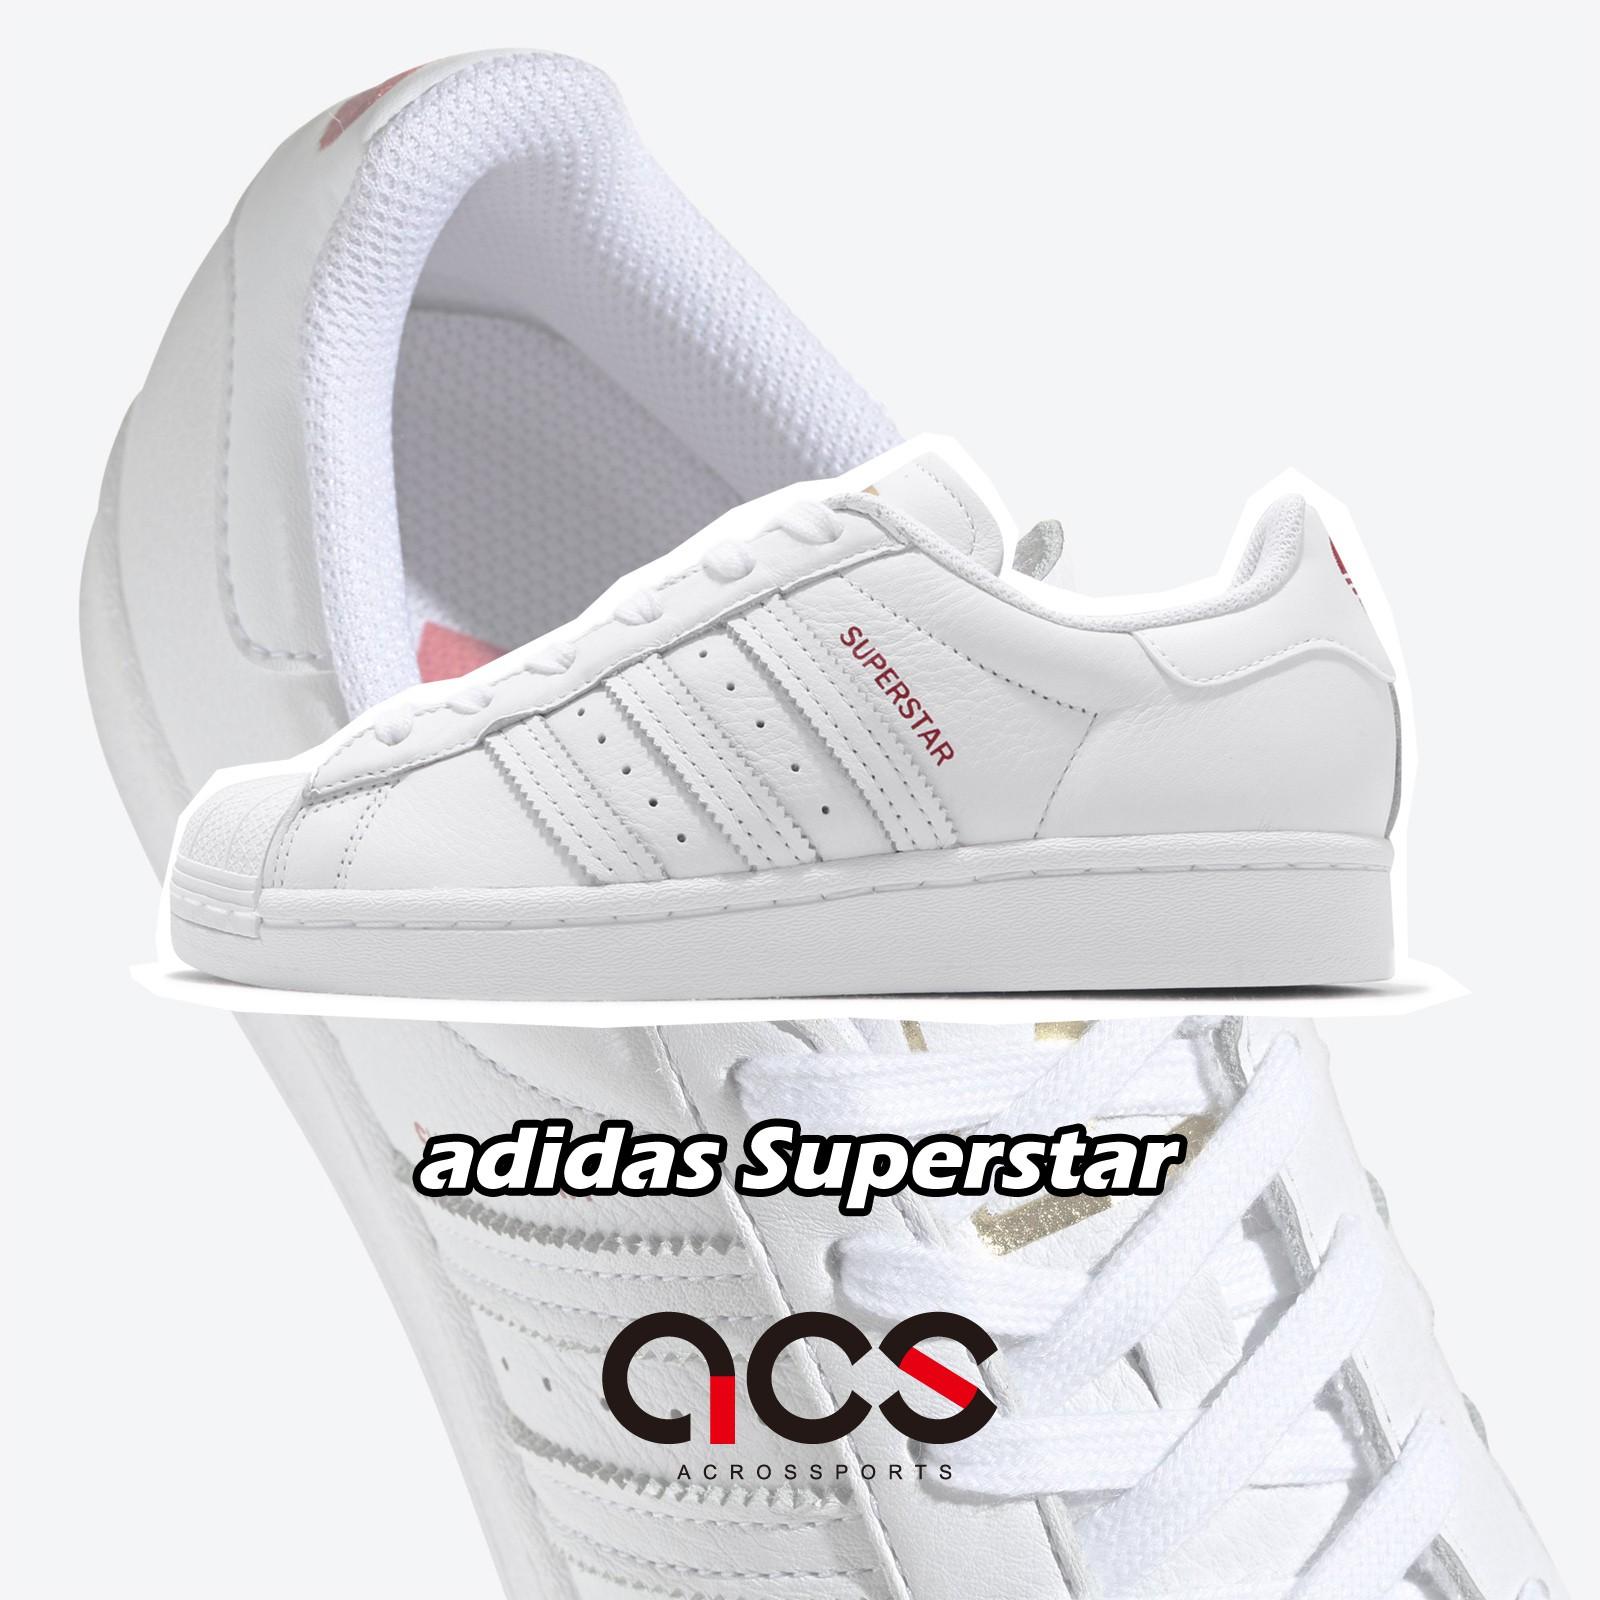 adidas 休閒鞋 V-DAY Superstar 情人節 金標 愛心 小白鞋 白 紅 女鞋 FX1203 【ACS】